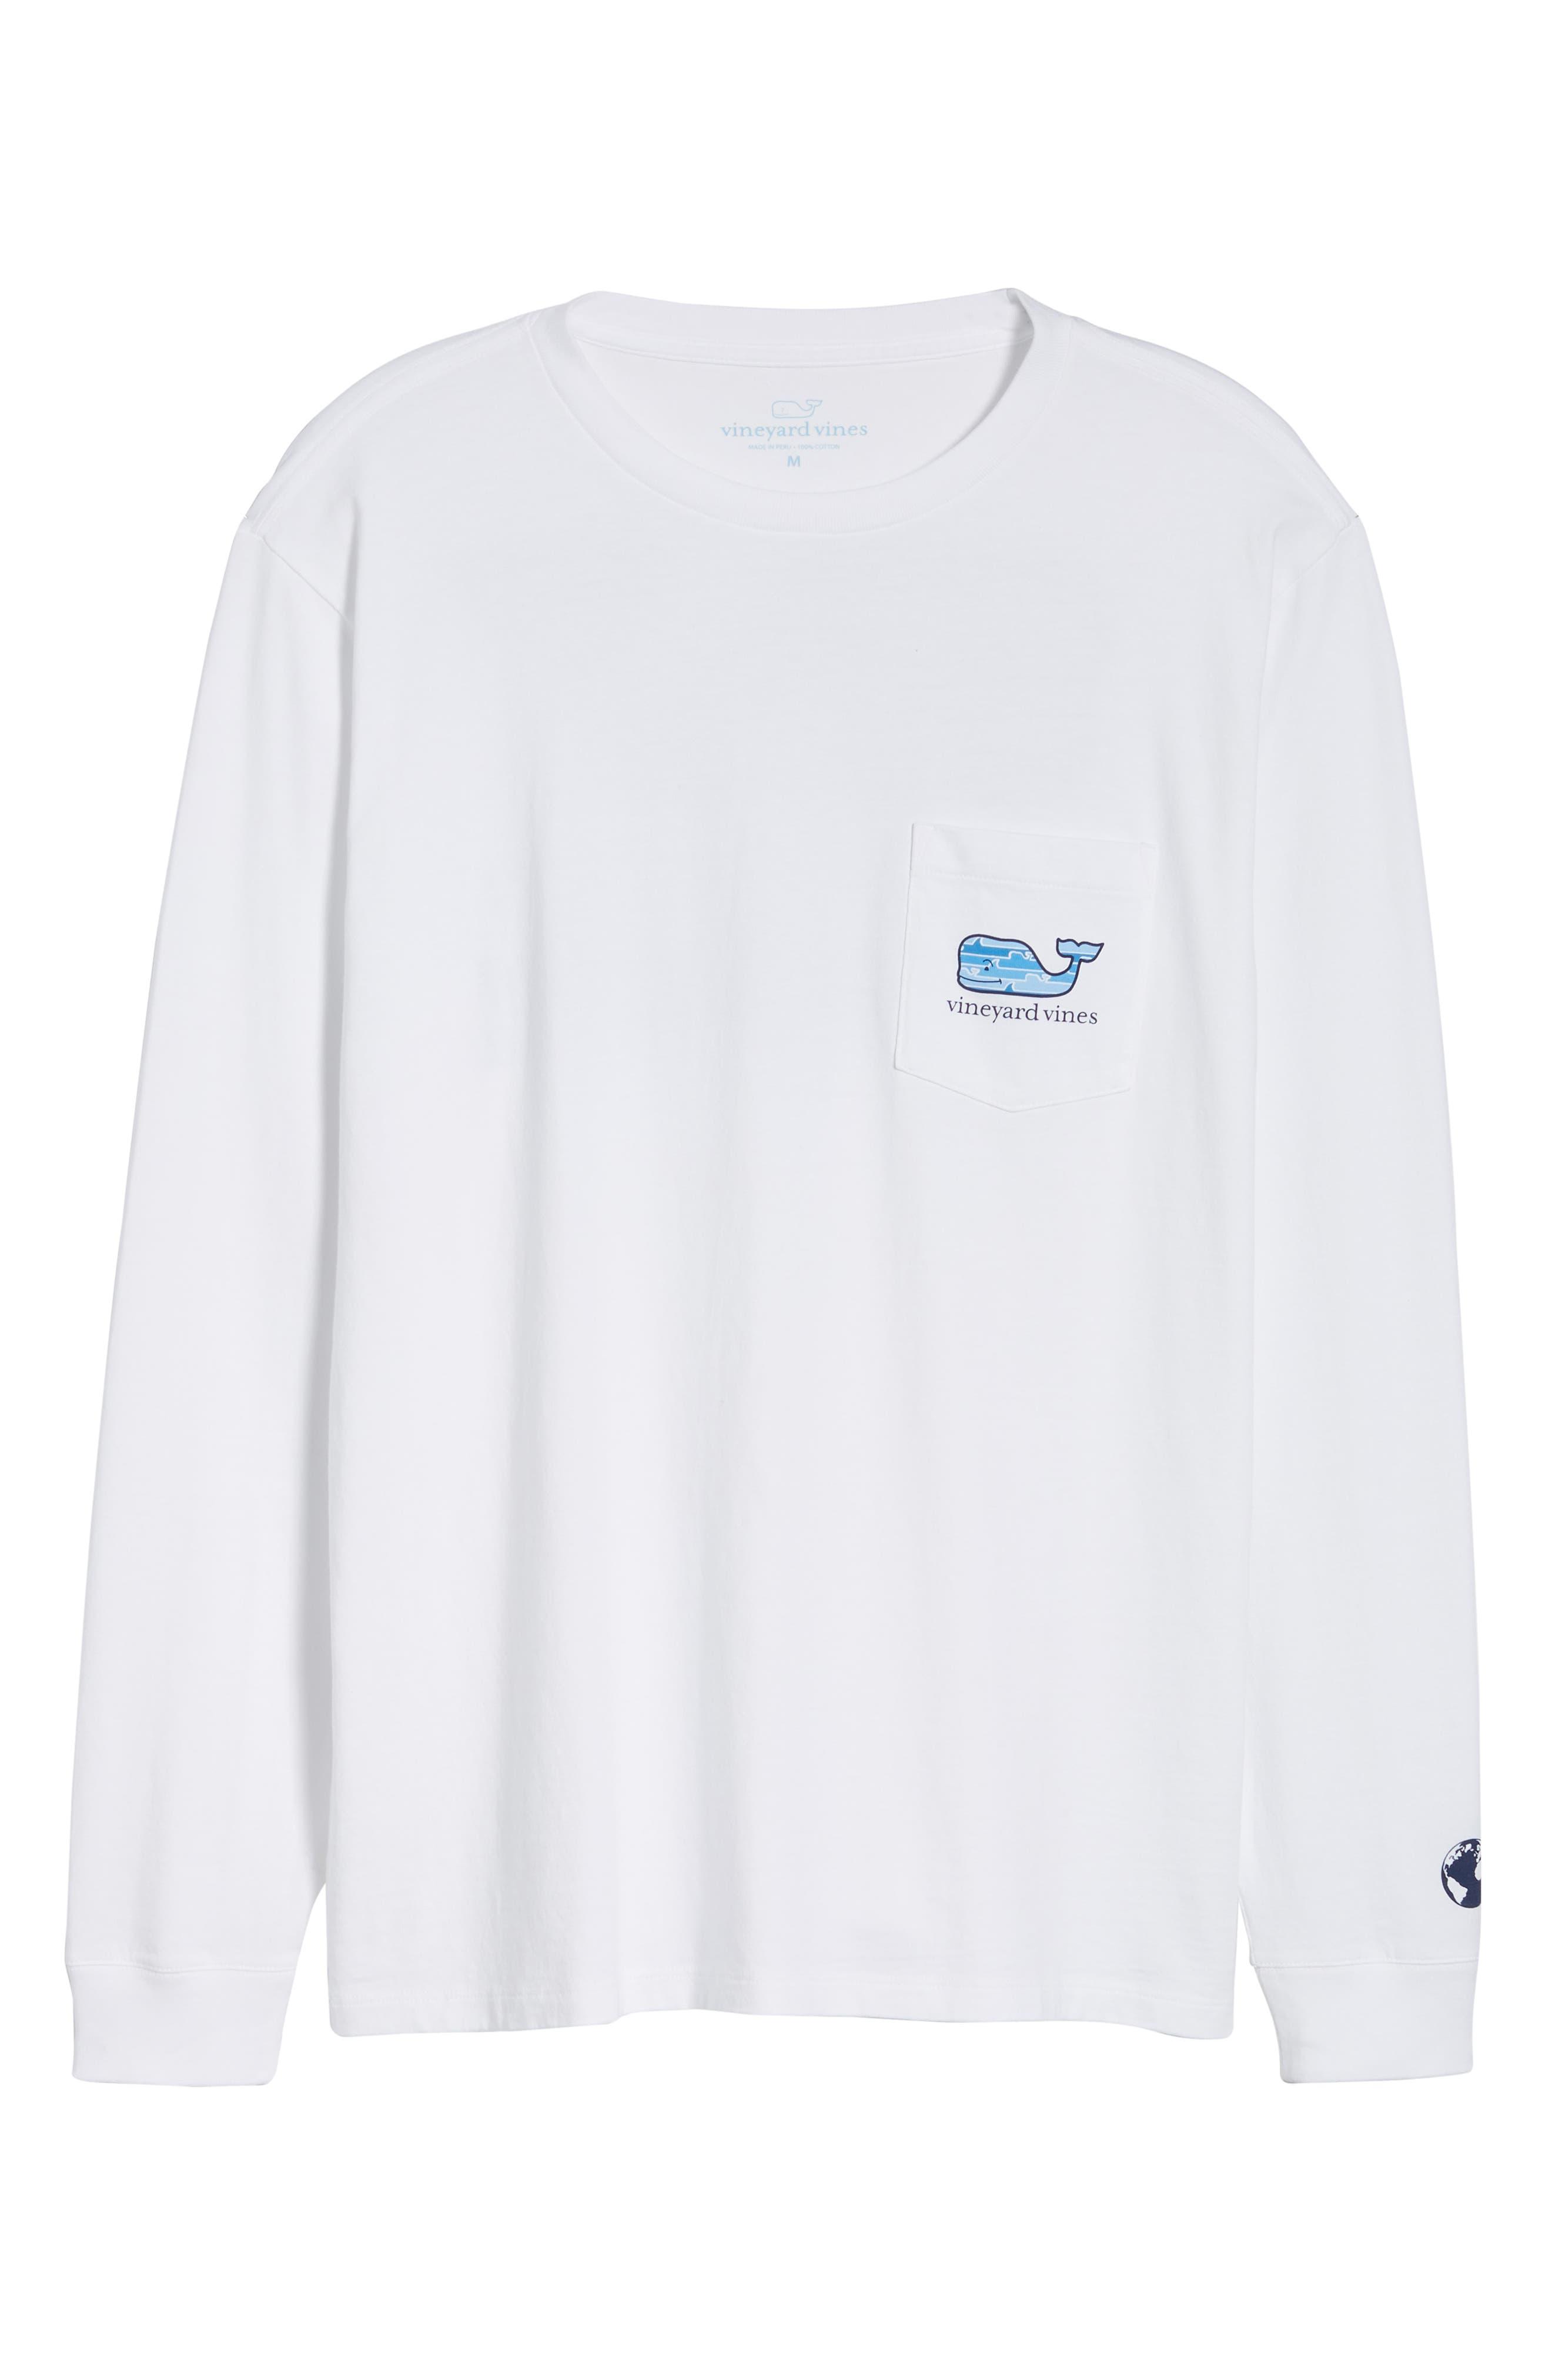 x Shark Week<sup>™</sup> Whaleline Long Sleeve Pocket T-Shirt,                             Alternate thumbnail 6, color,                             White Cap